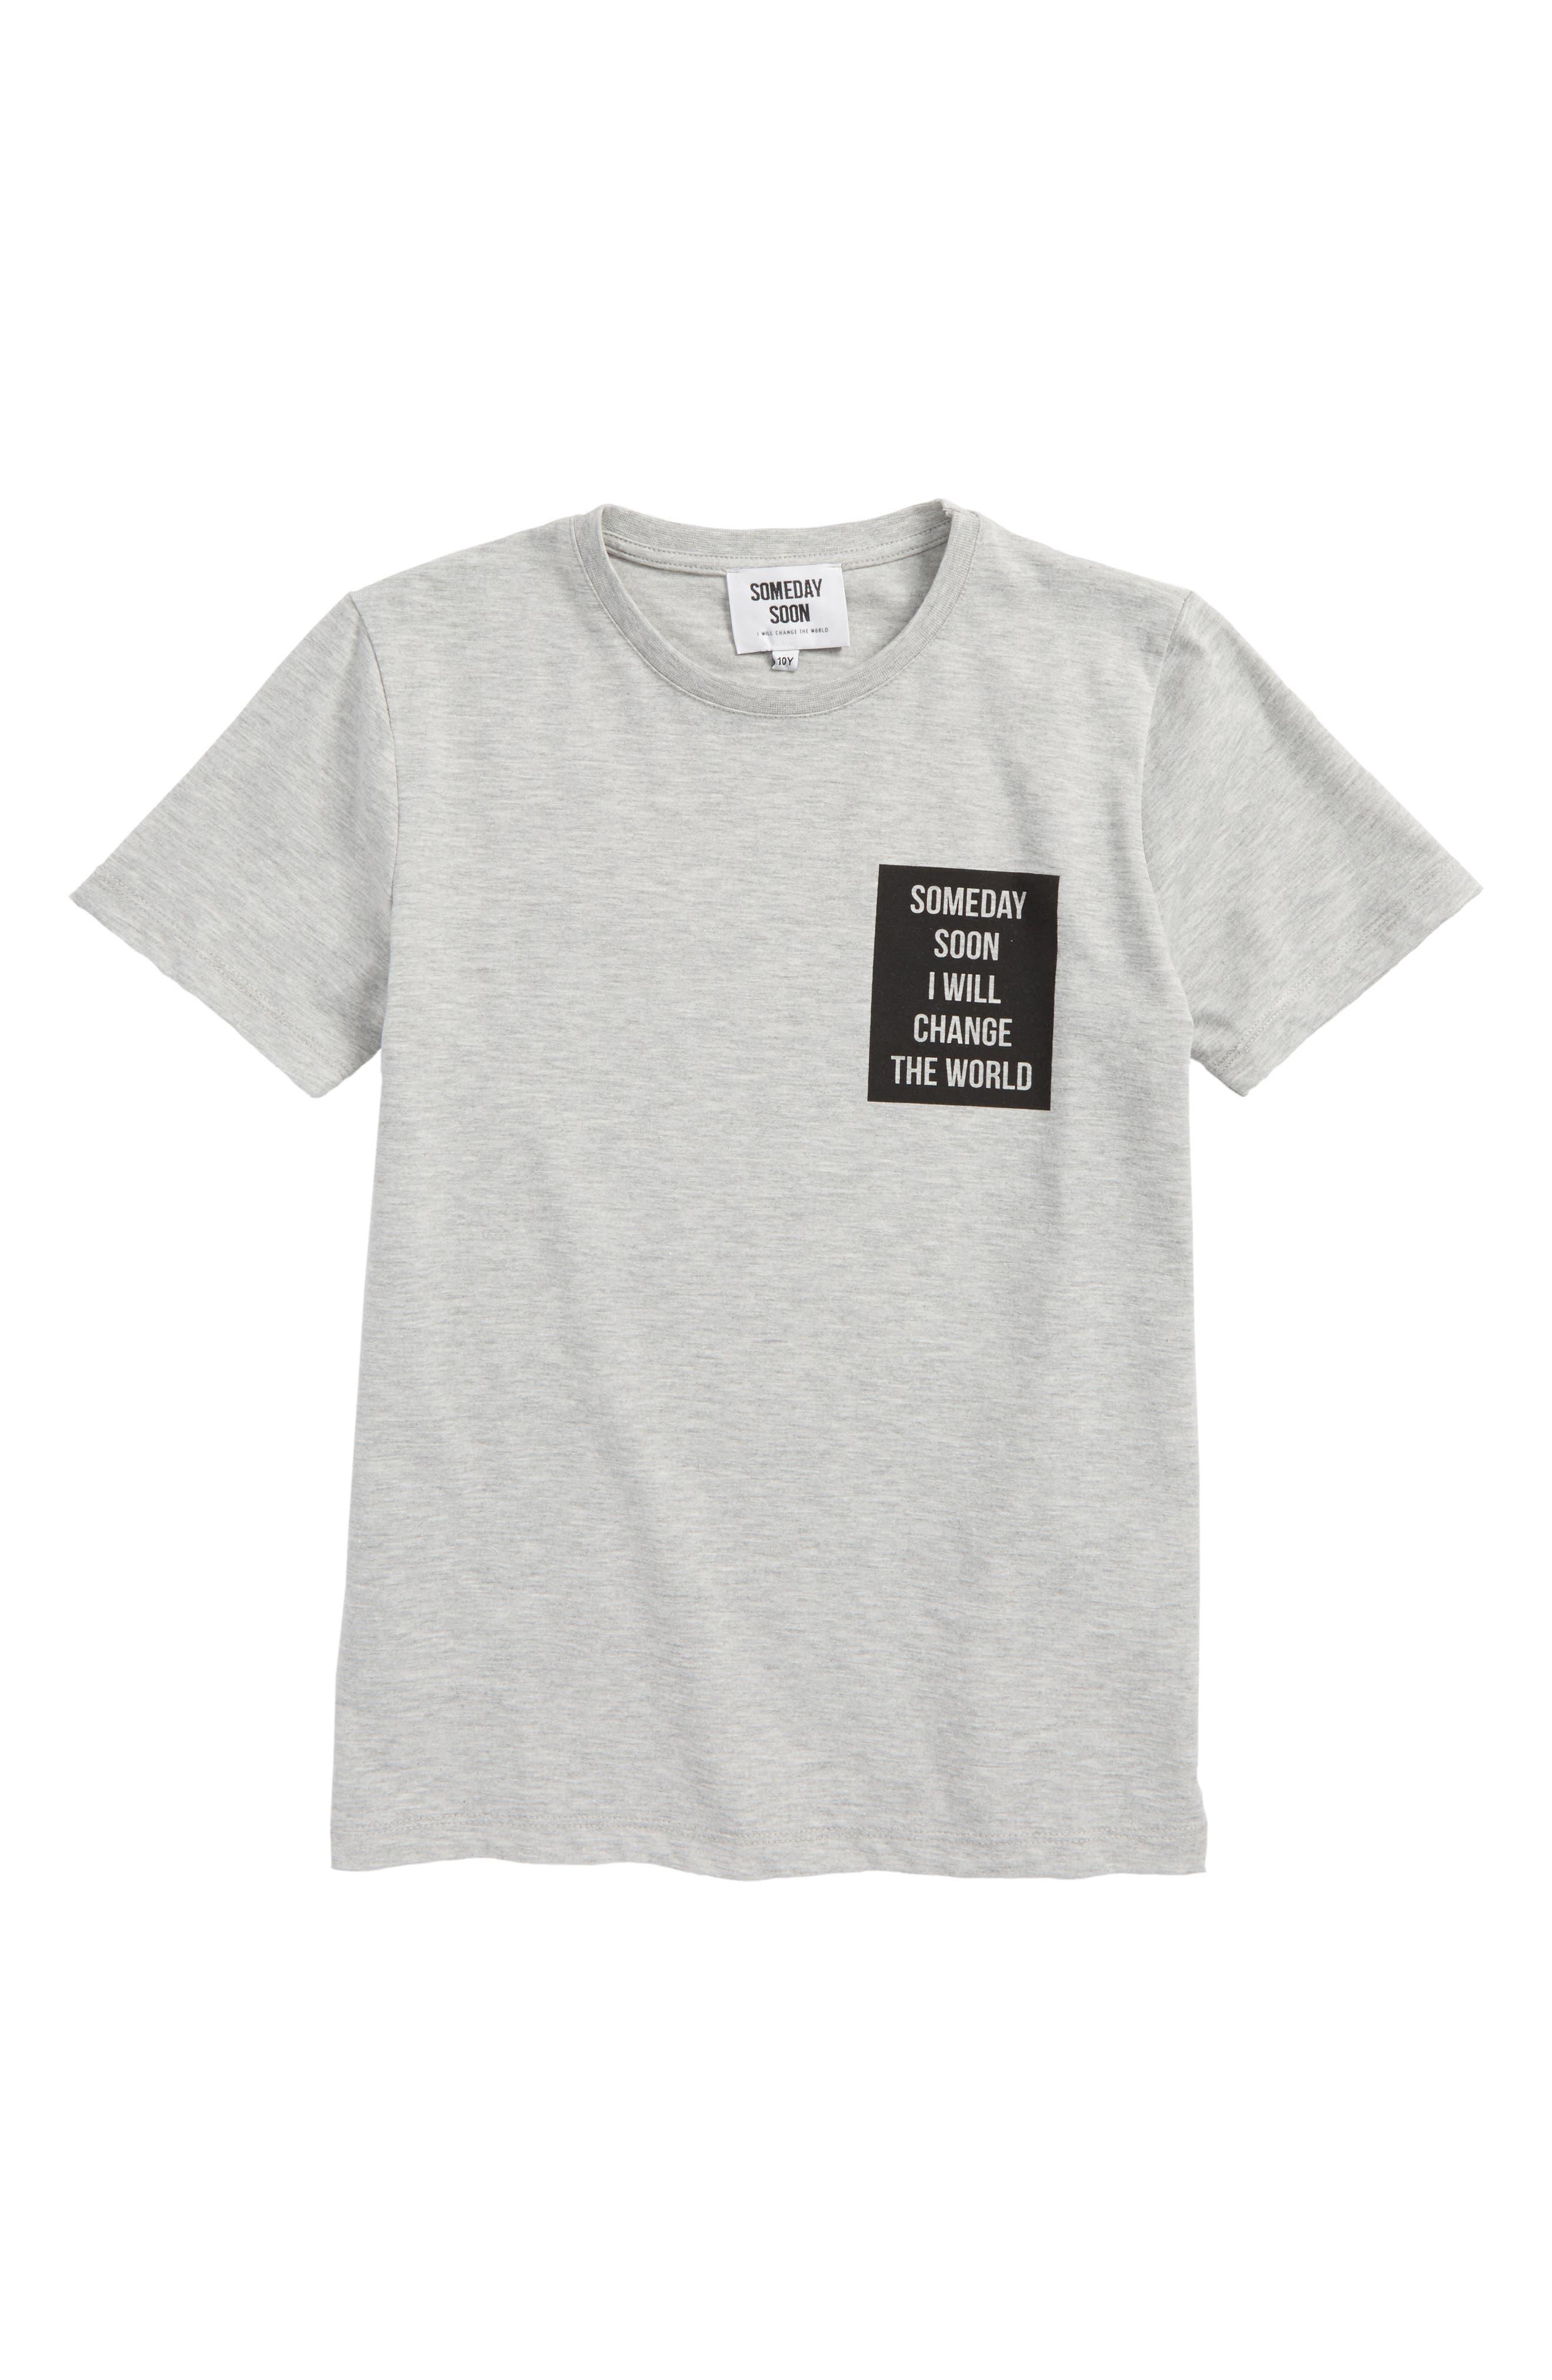 Vista Graphic T-Shirt,                             Main thumbnail 1, color,                             Grey Melange